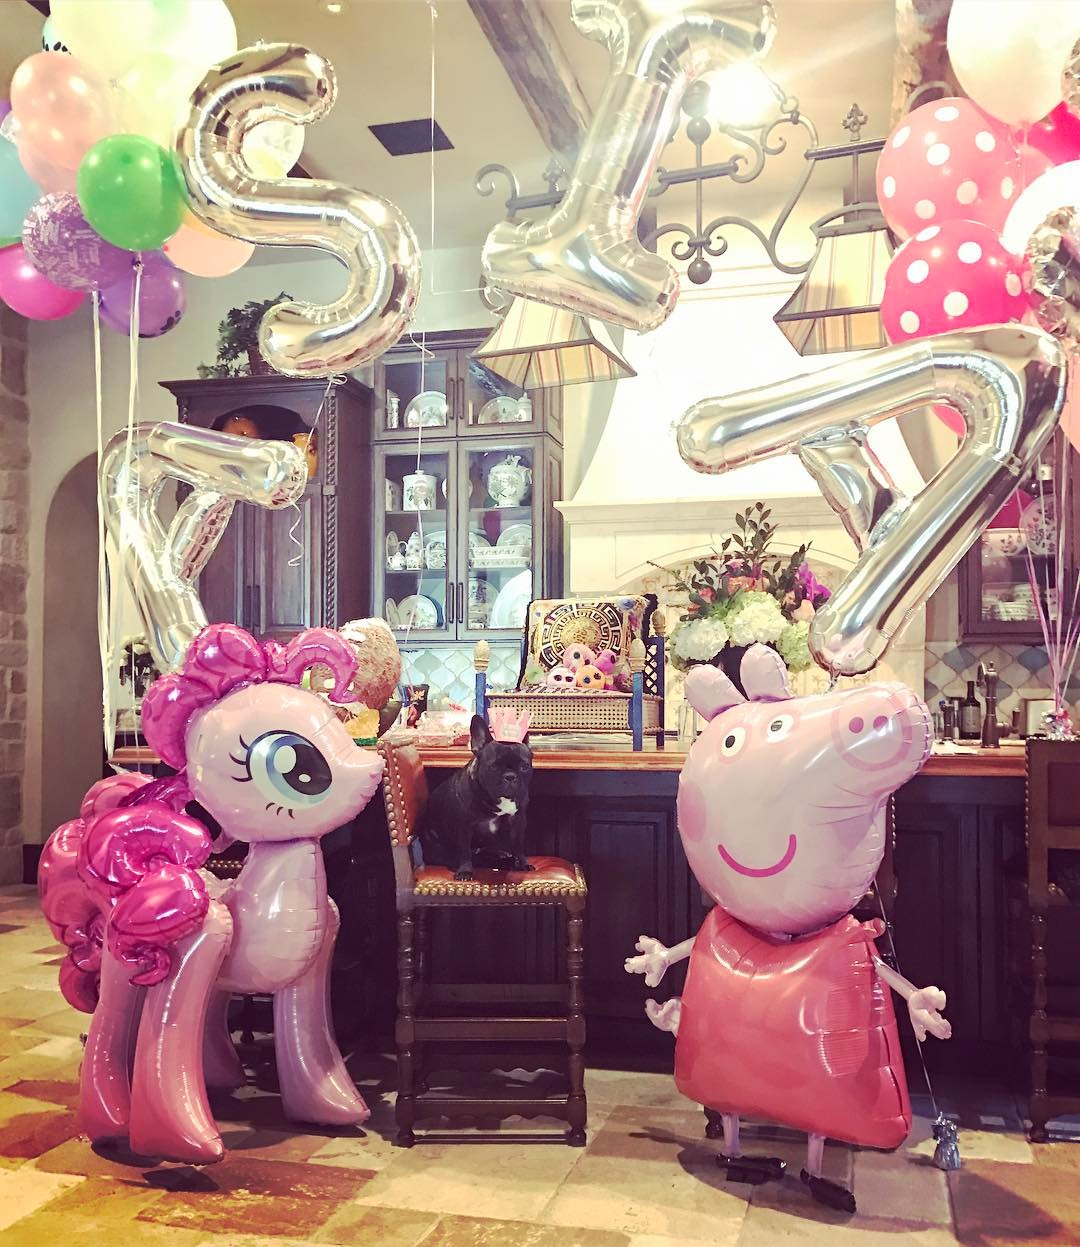 Lady Gaga - Miss Asia Kinney celebrates her 3rd birthday!